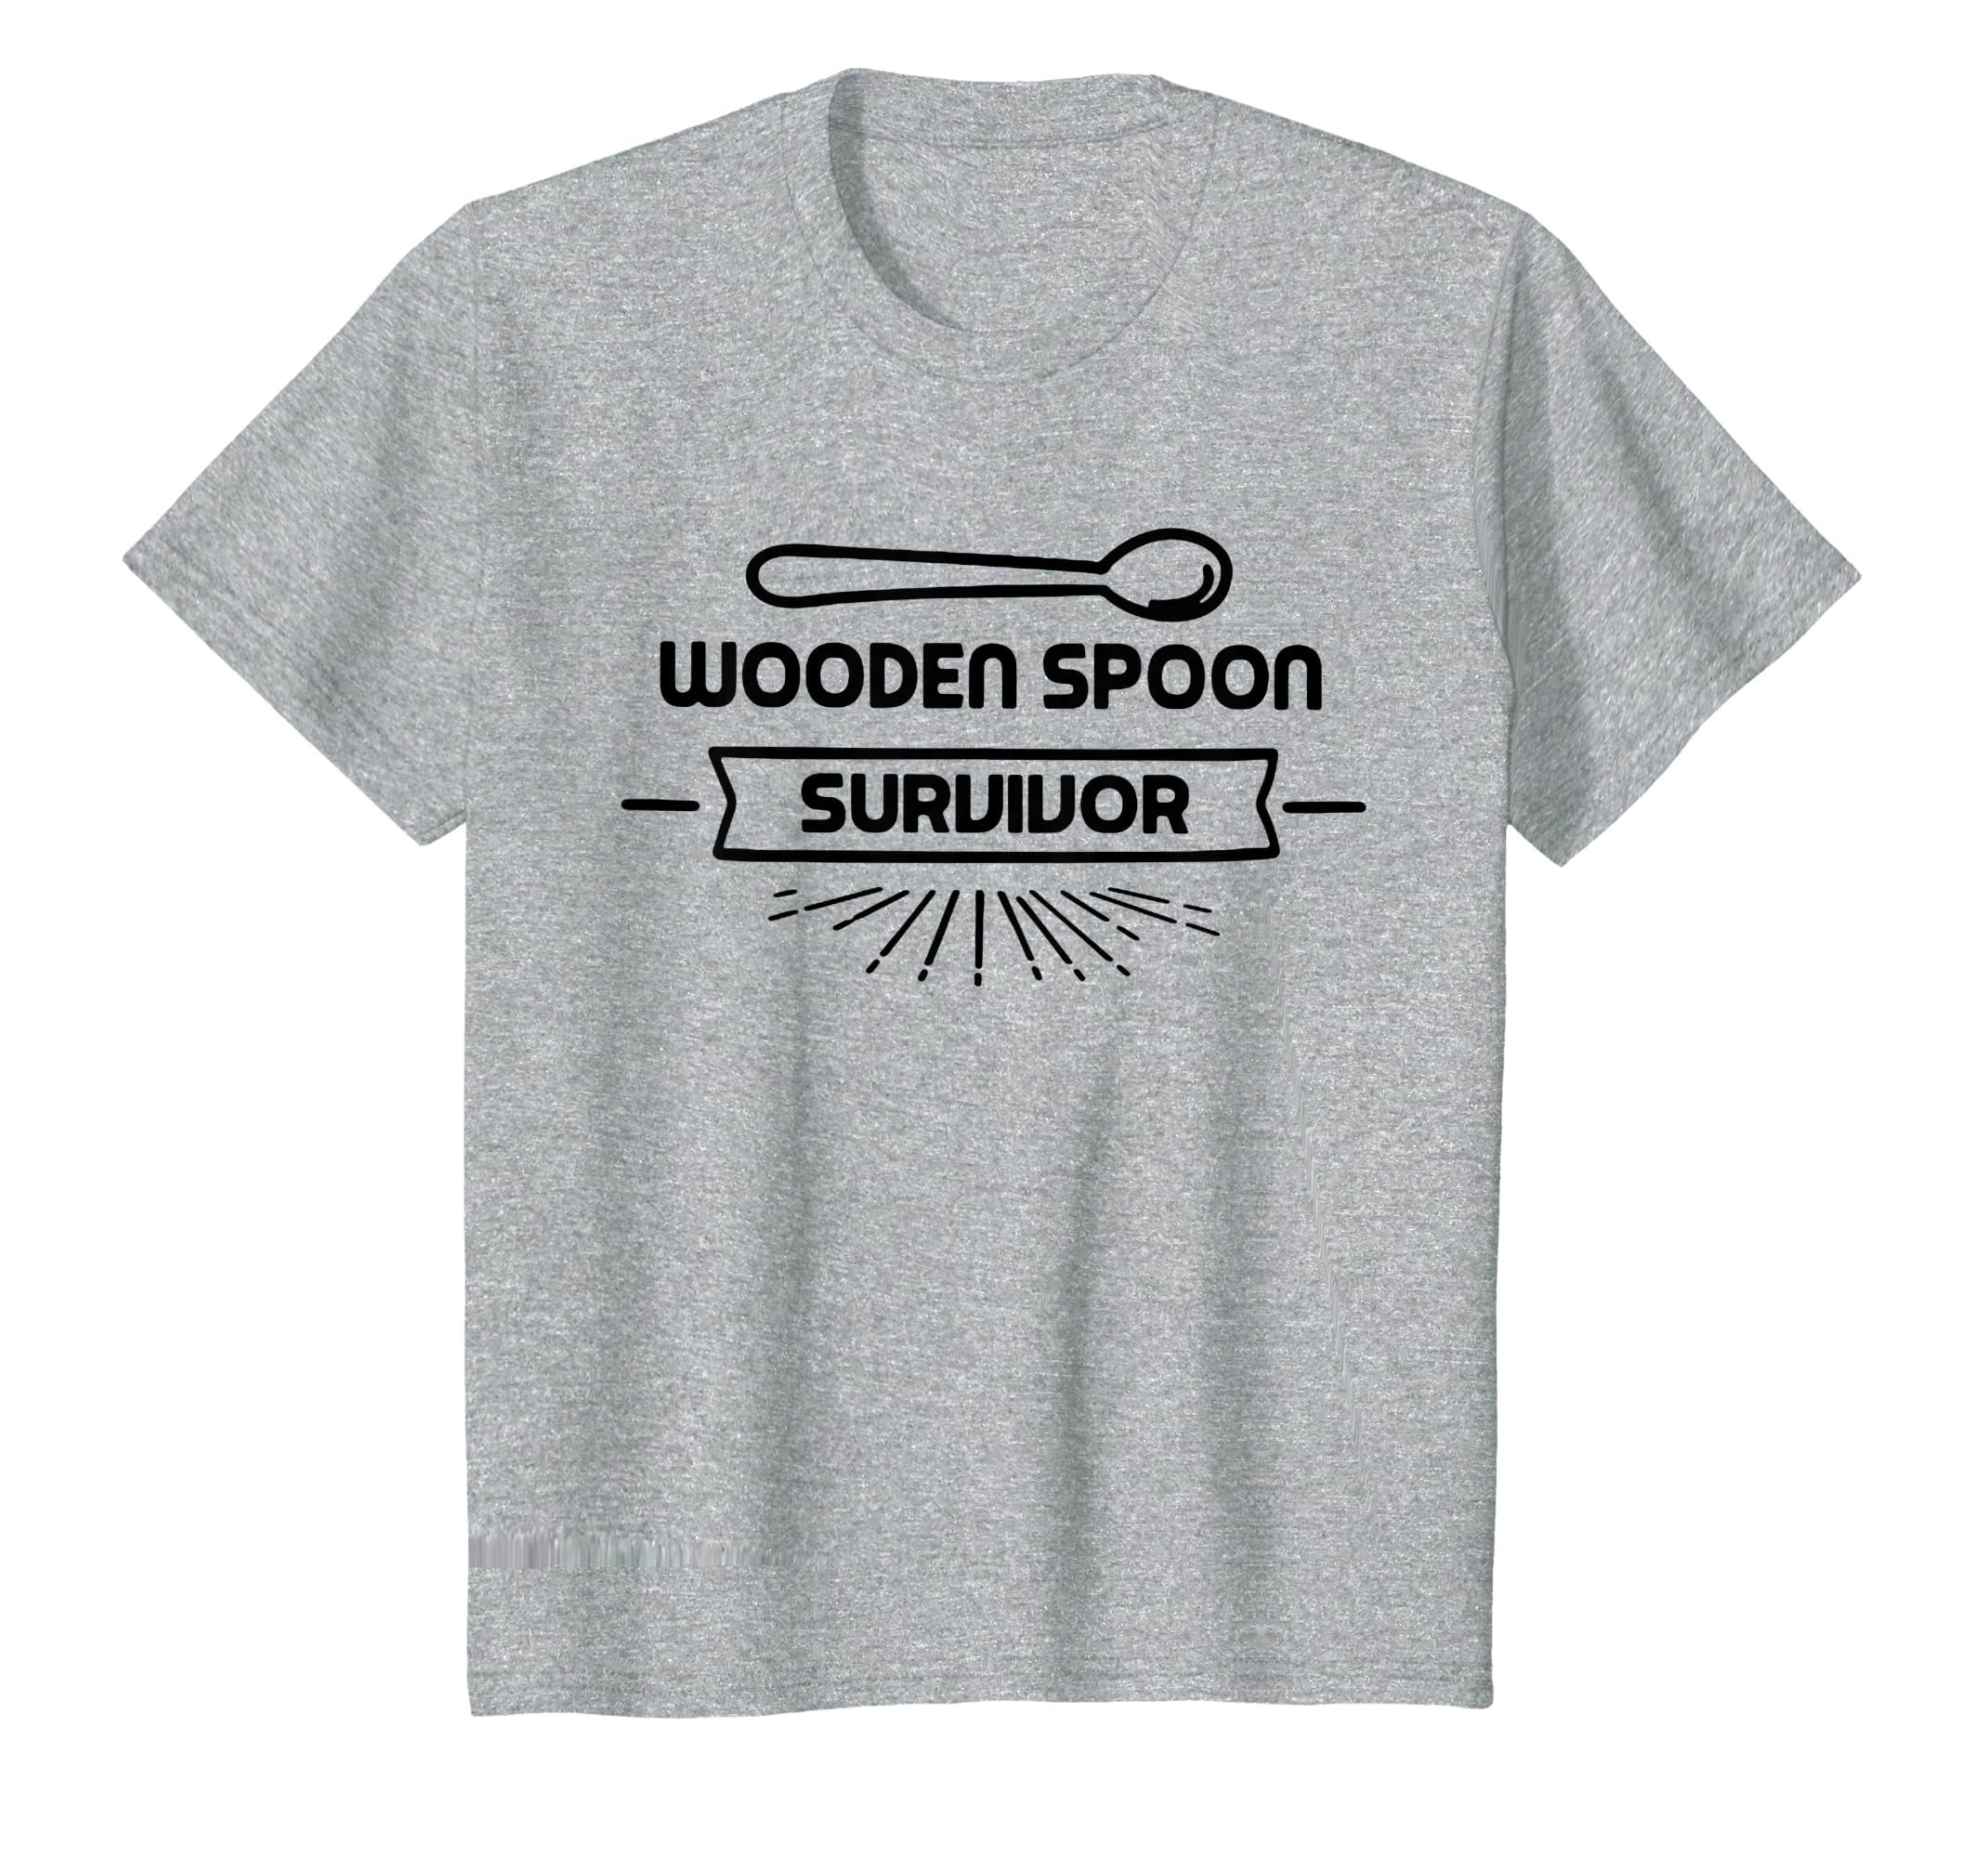 Amazoncom Wooden Spoon Survivor Funny Prank Hilarious Game Shirt